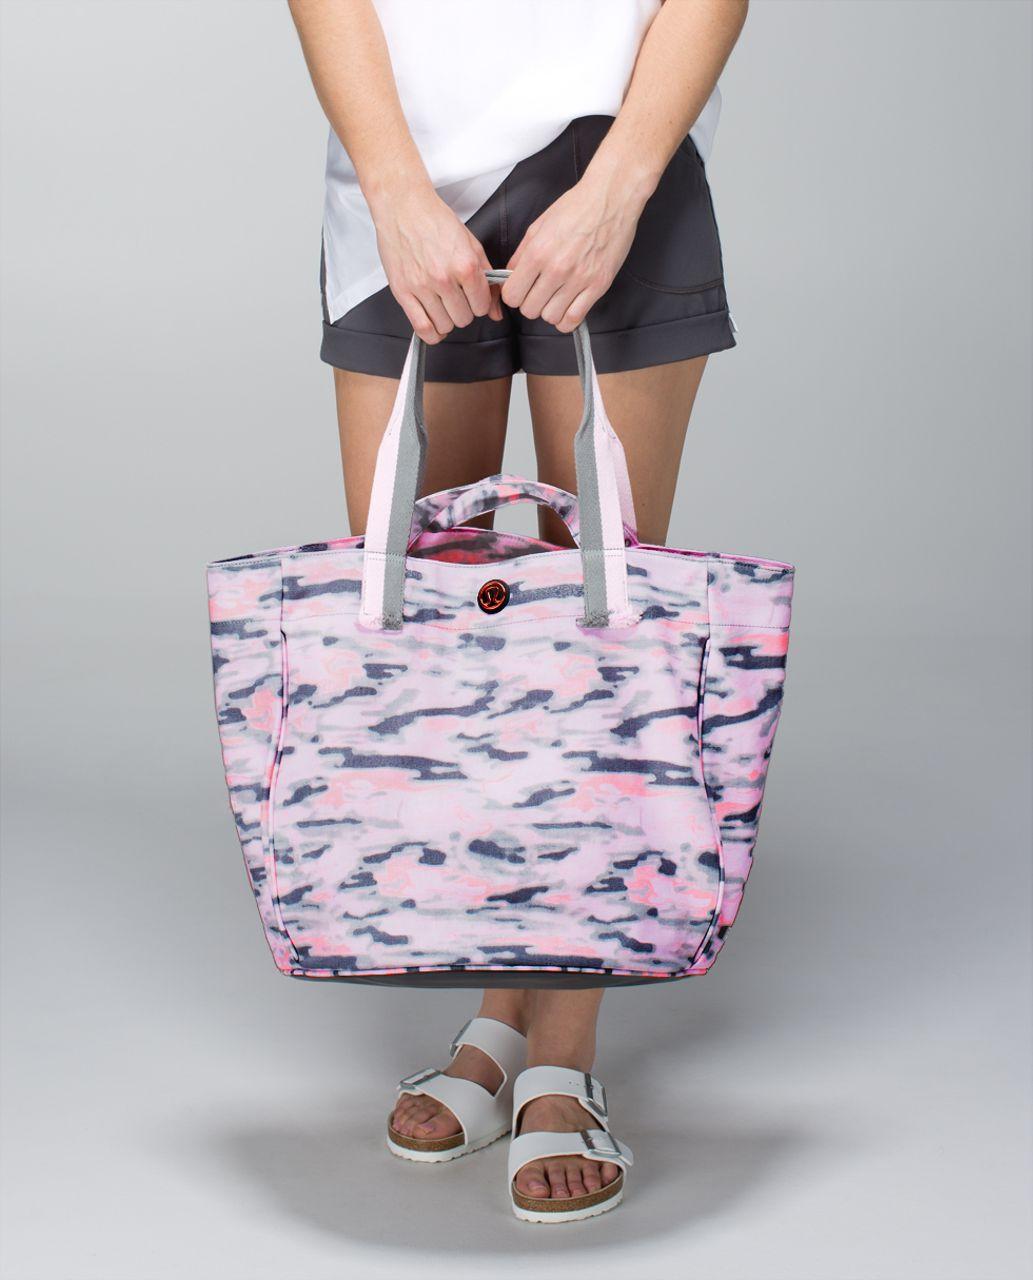 Lululemon Beach Breaker Bag - Wamo Camo Barely Pink / Exploded Manifesto Pop Block Embossed Bleached Coral